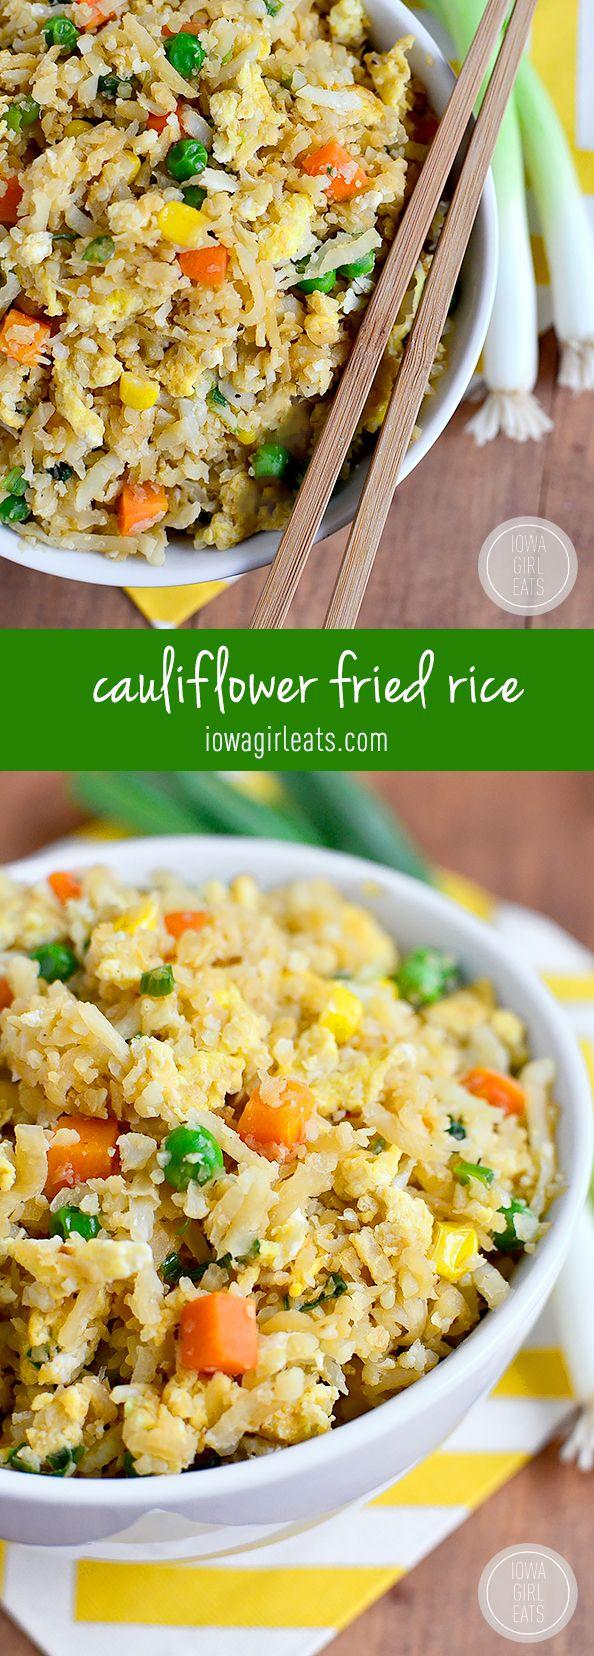 Cauliflower Fried Rice - Iowa Girl Eats